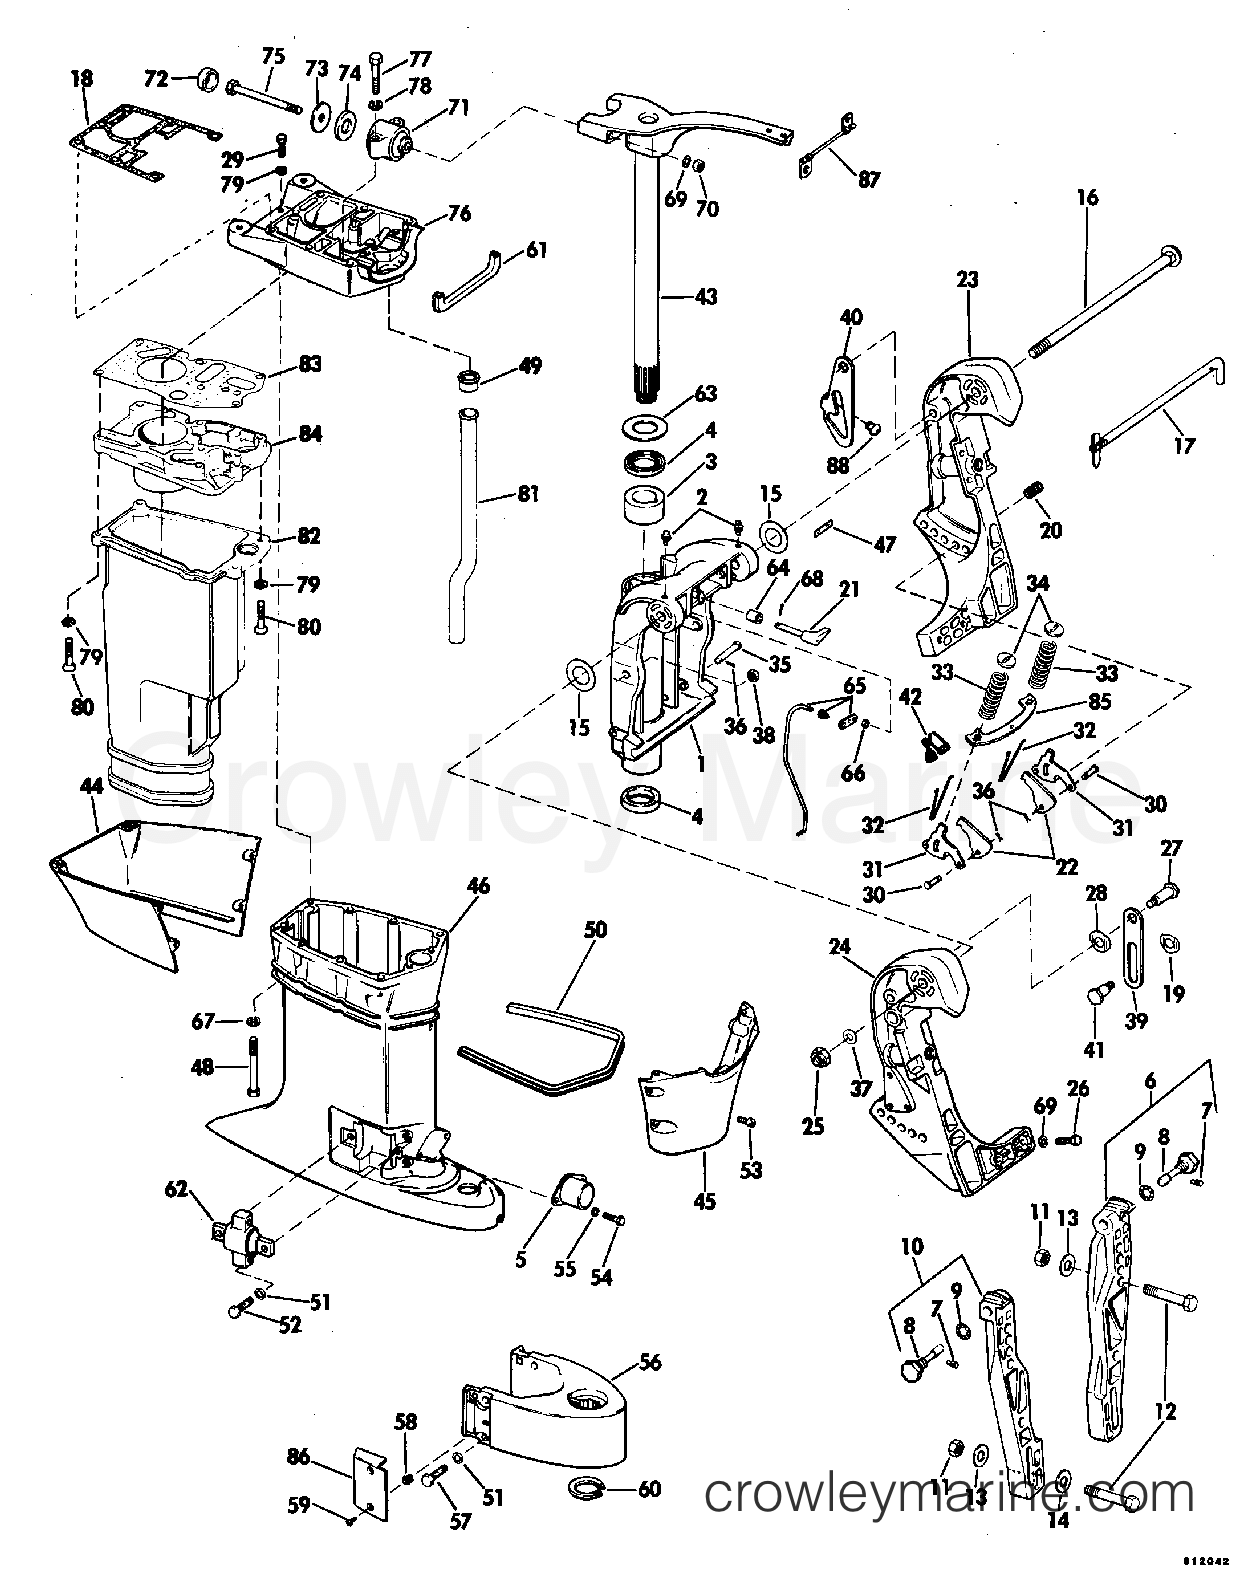 Exhaust Housing 15 Transom